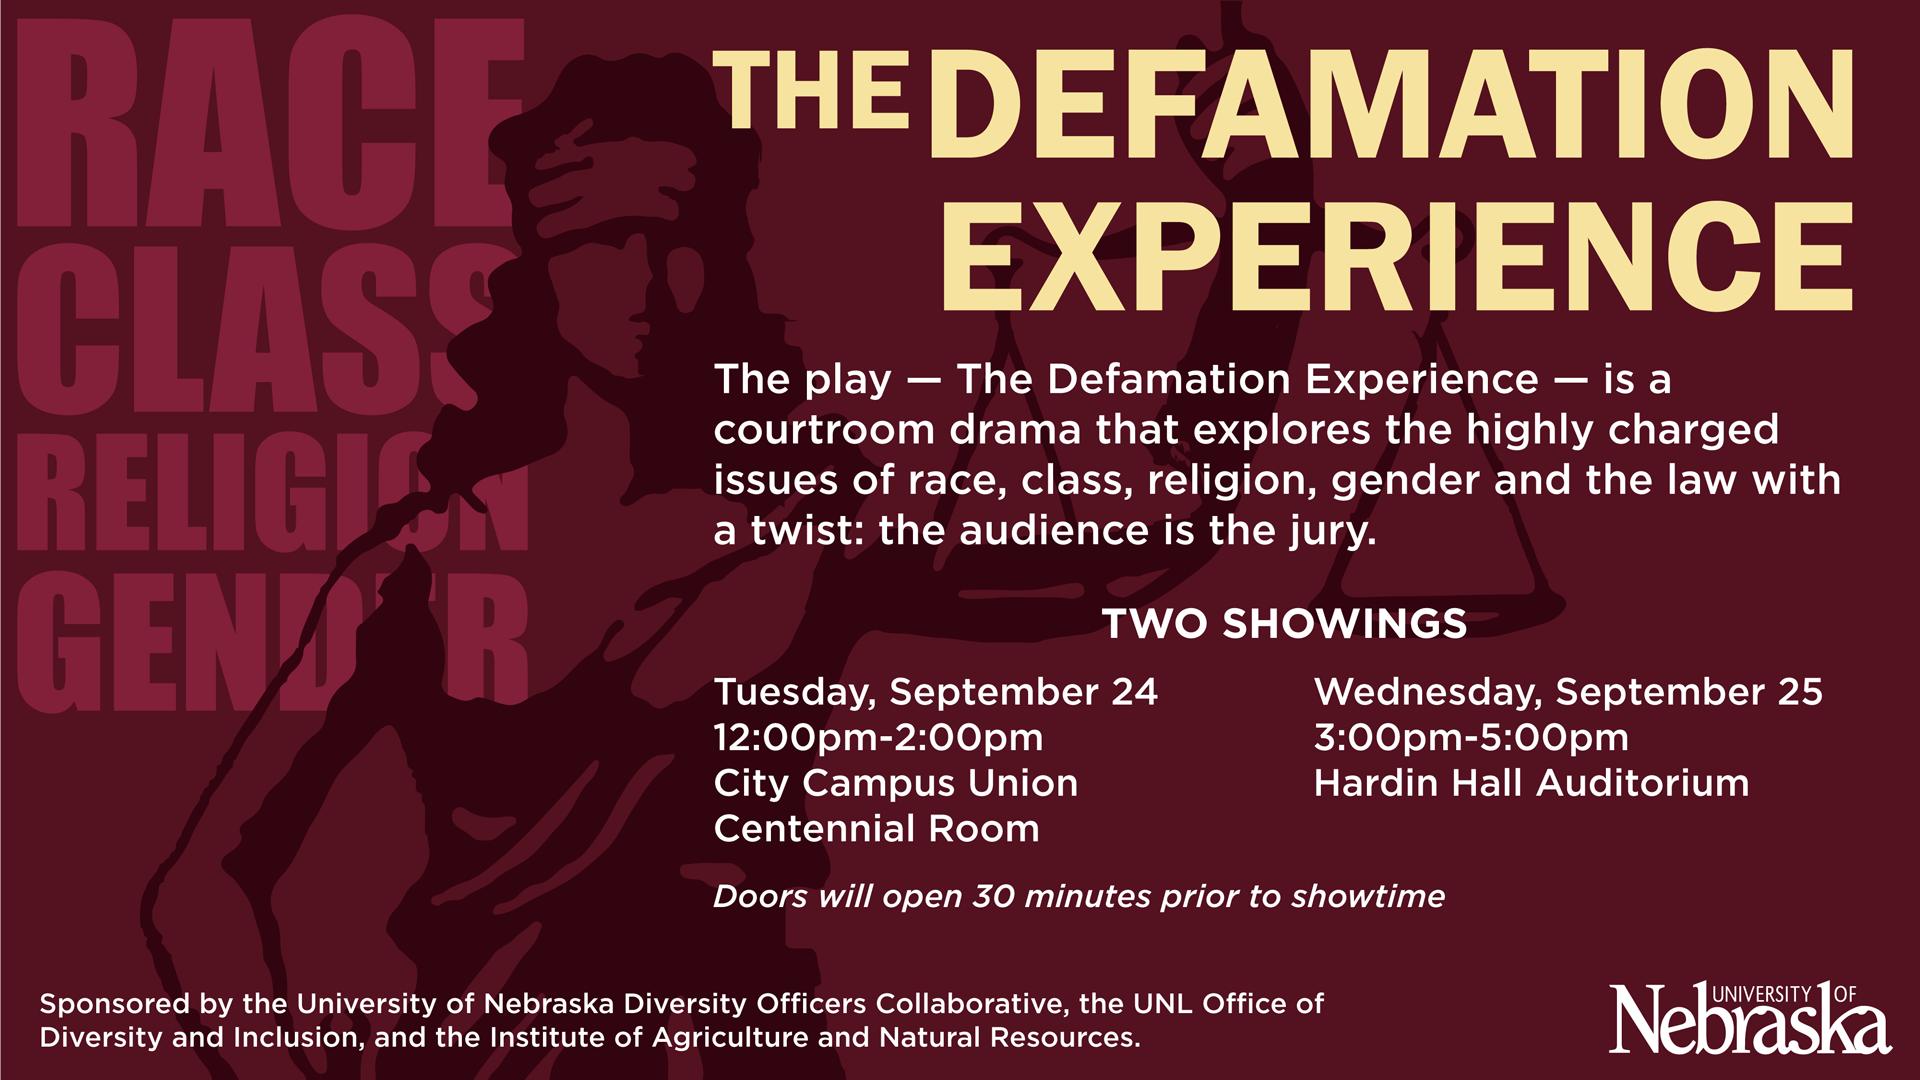 Defamation Experience Digital Signage